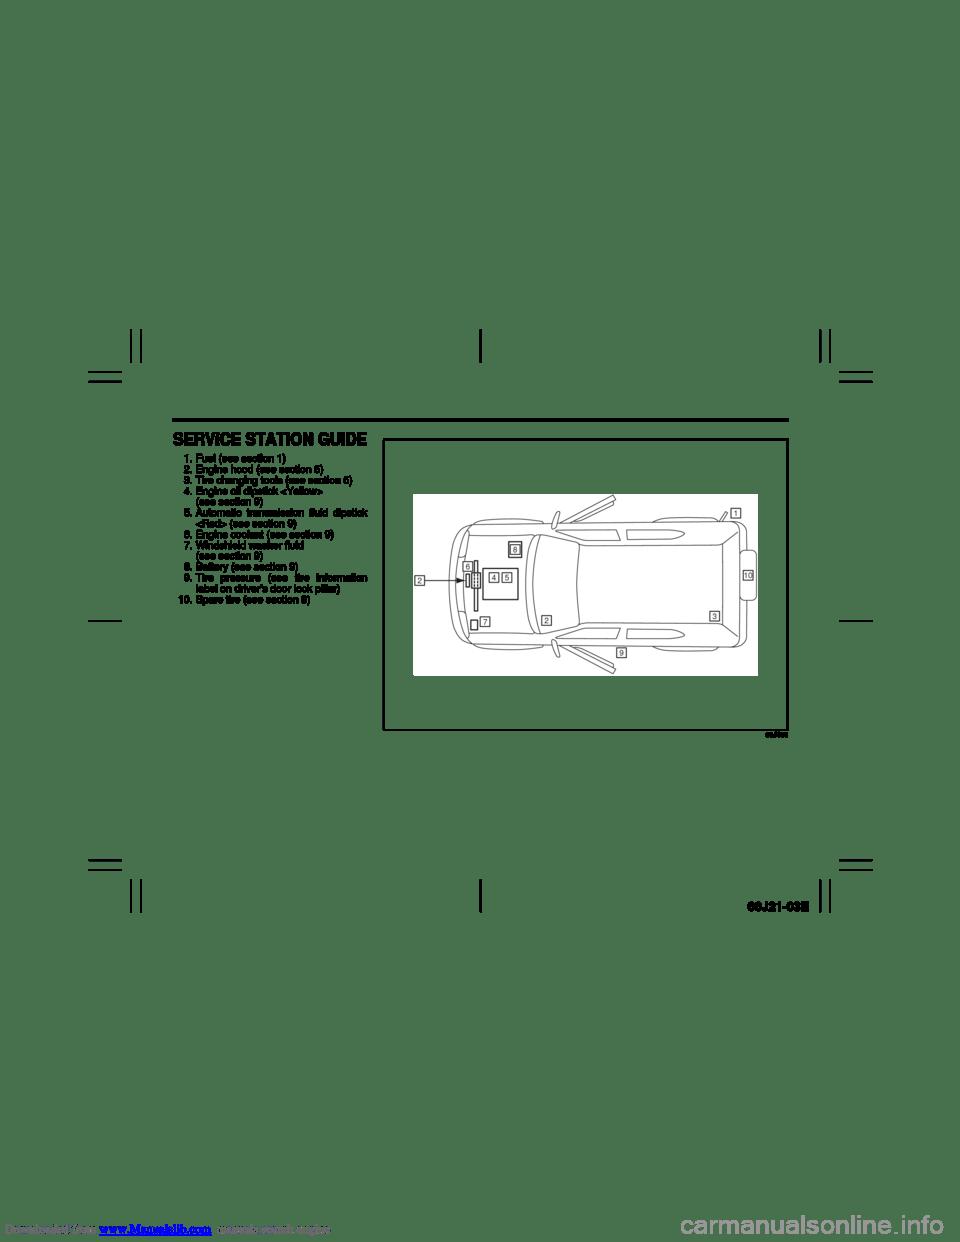 medium resolution of 2008 suzuki xl7 repair manual free download